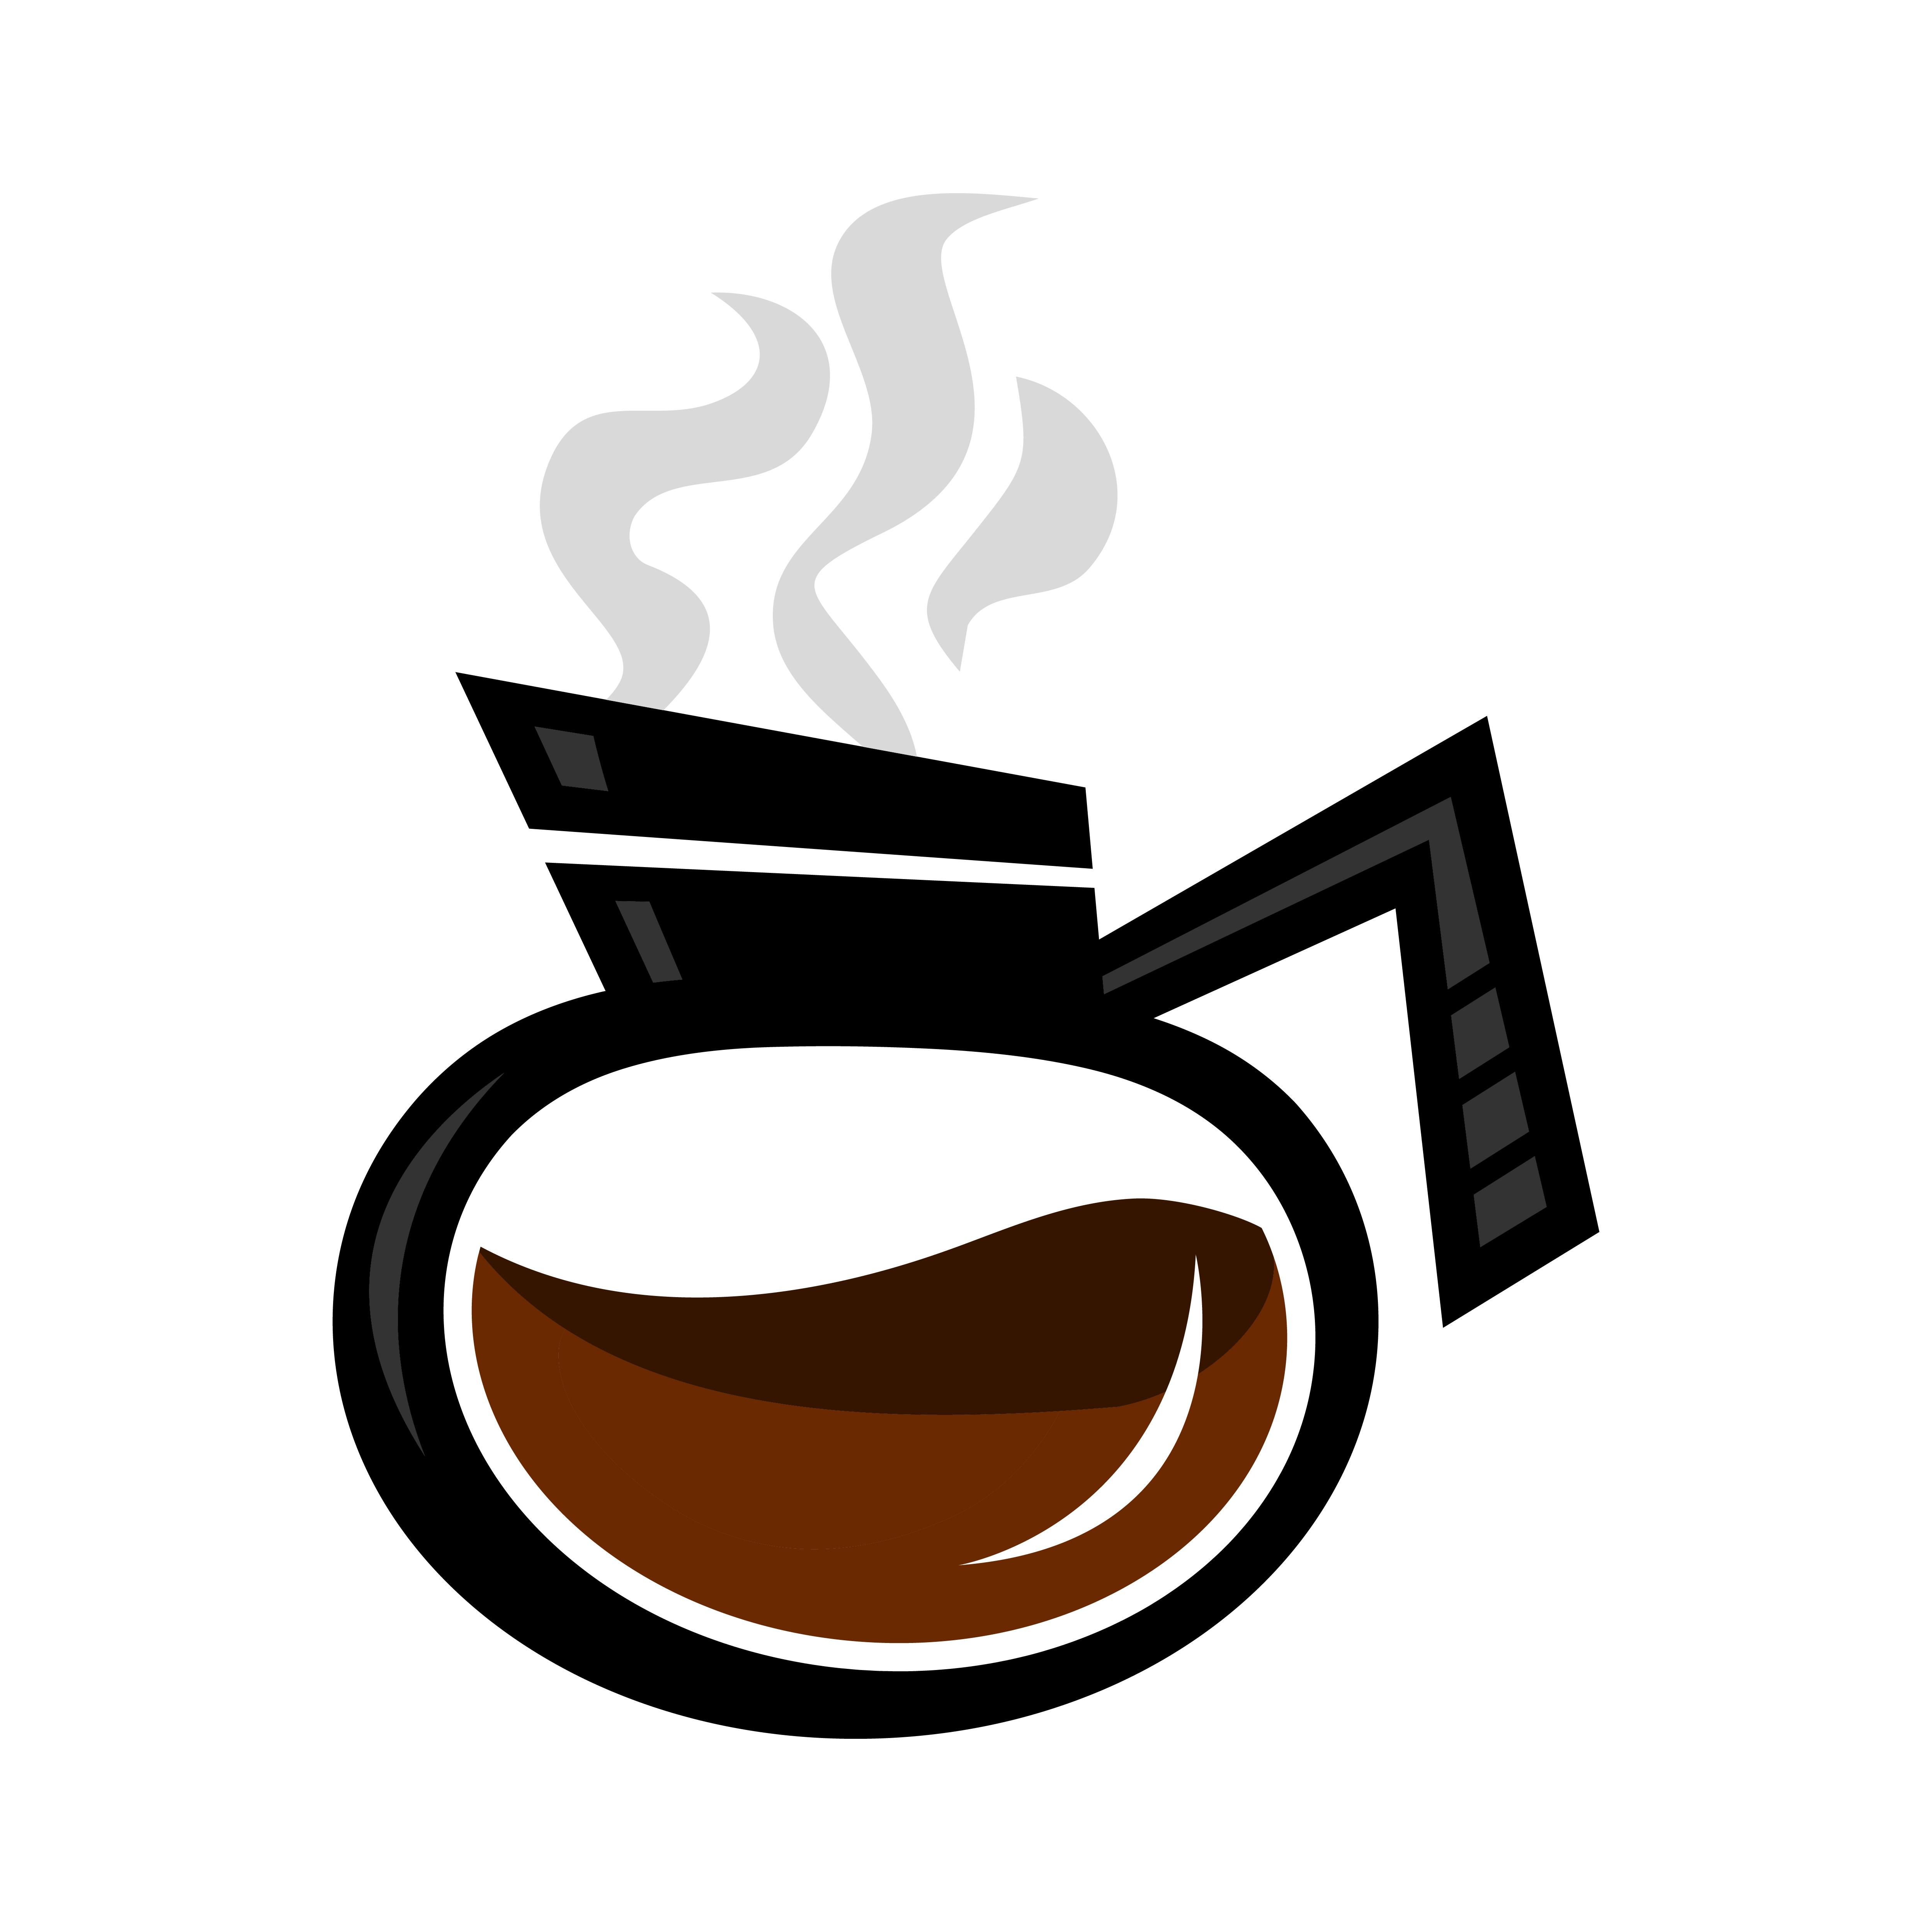 Coffee Pot Hot Drink Cartoon Illustration Download Free